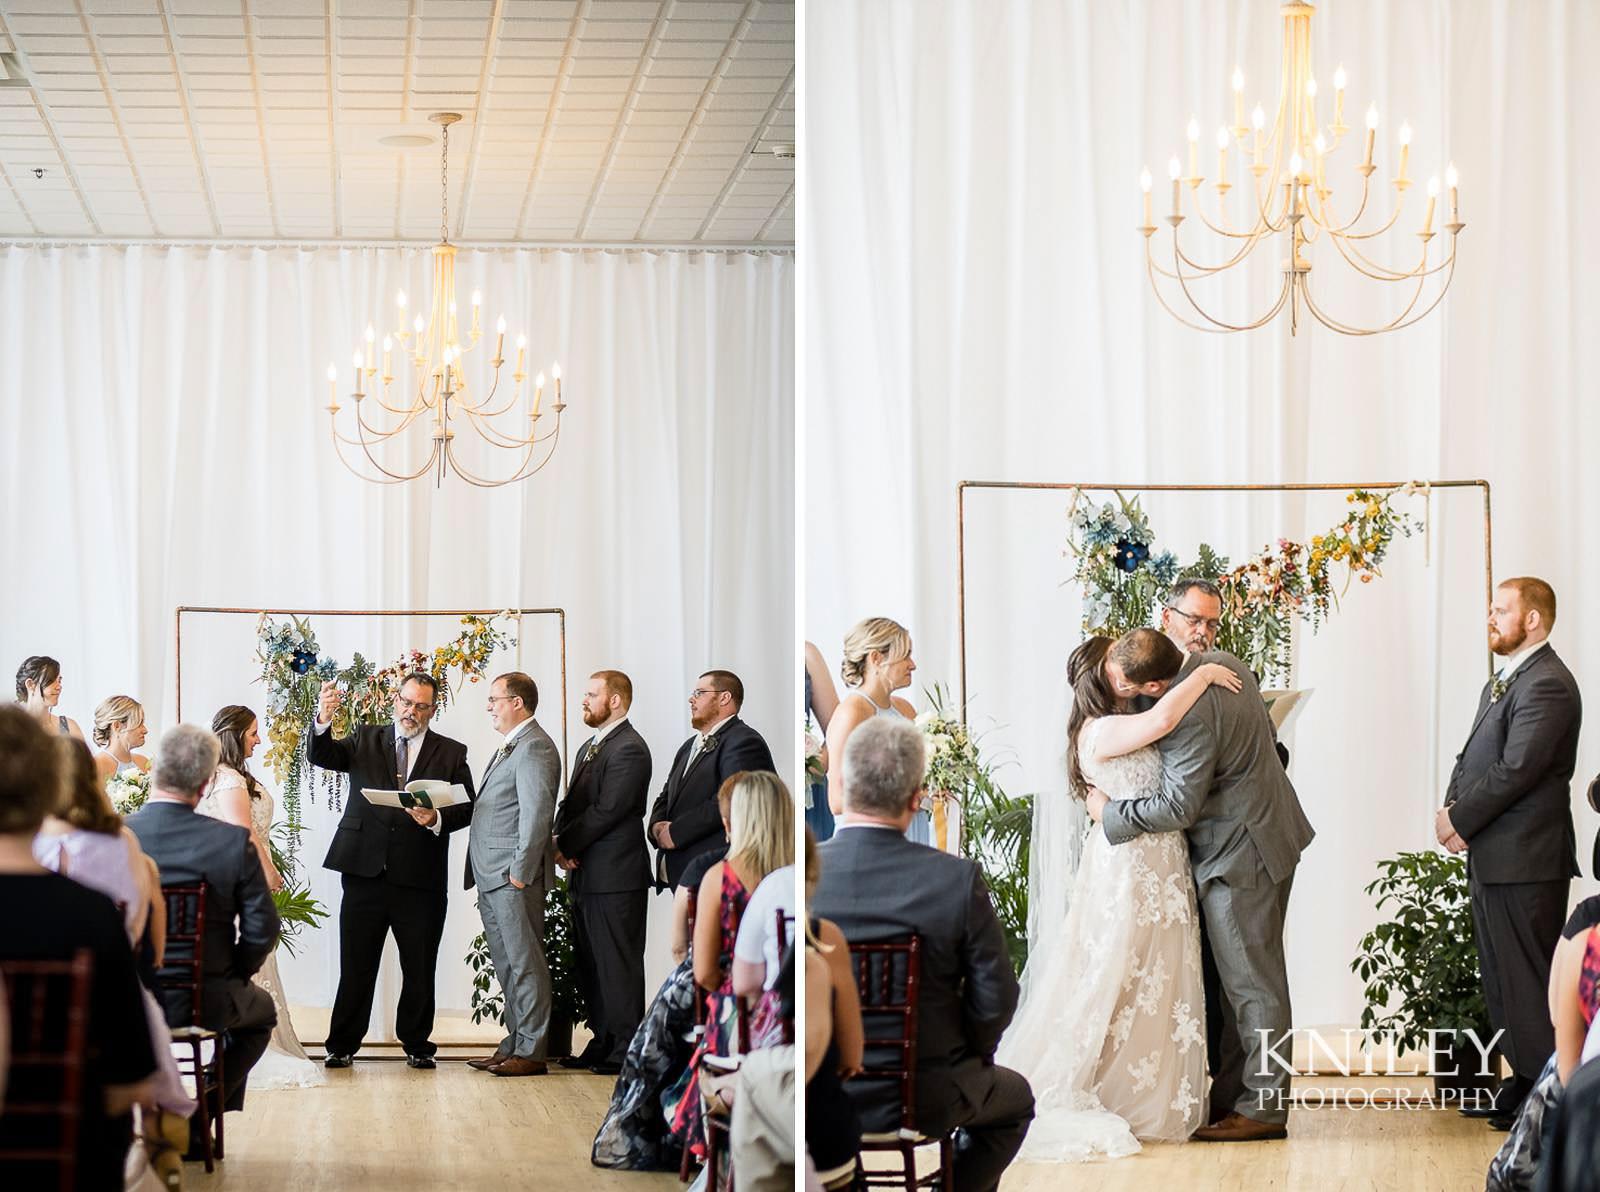 48-Arbor-at-the-Port-Rochester-NY-Wedding-Photography.jpg